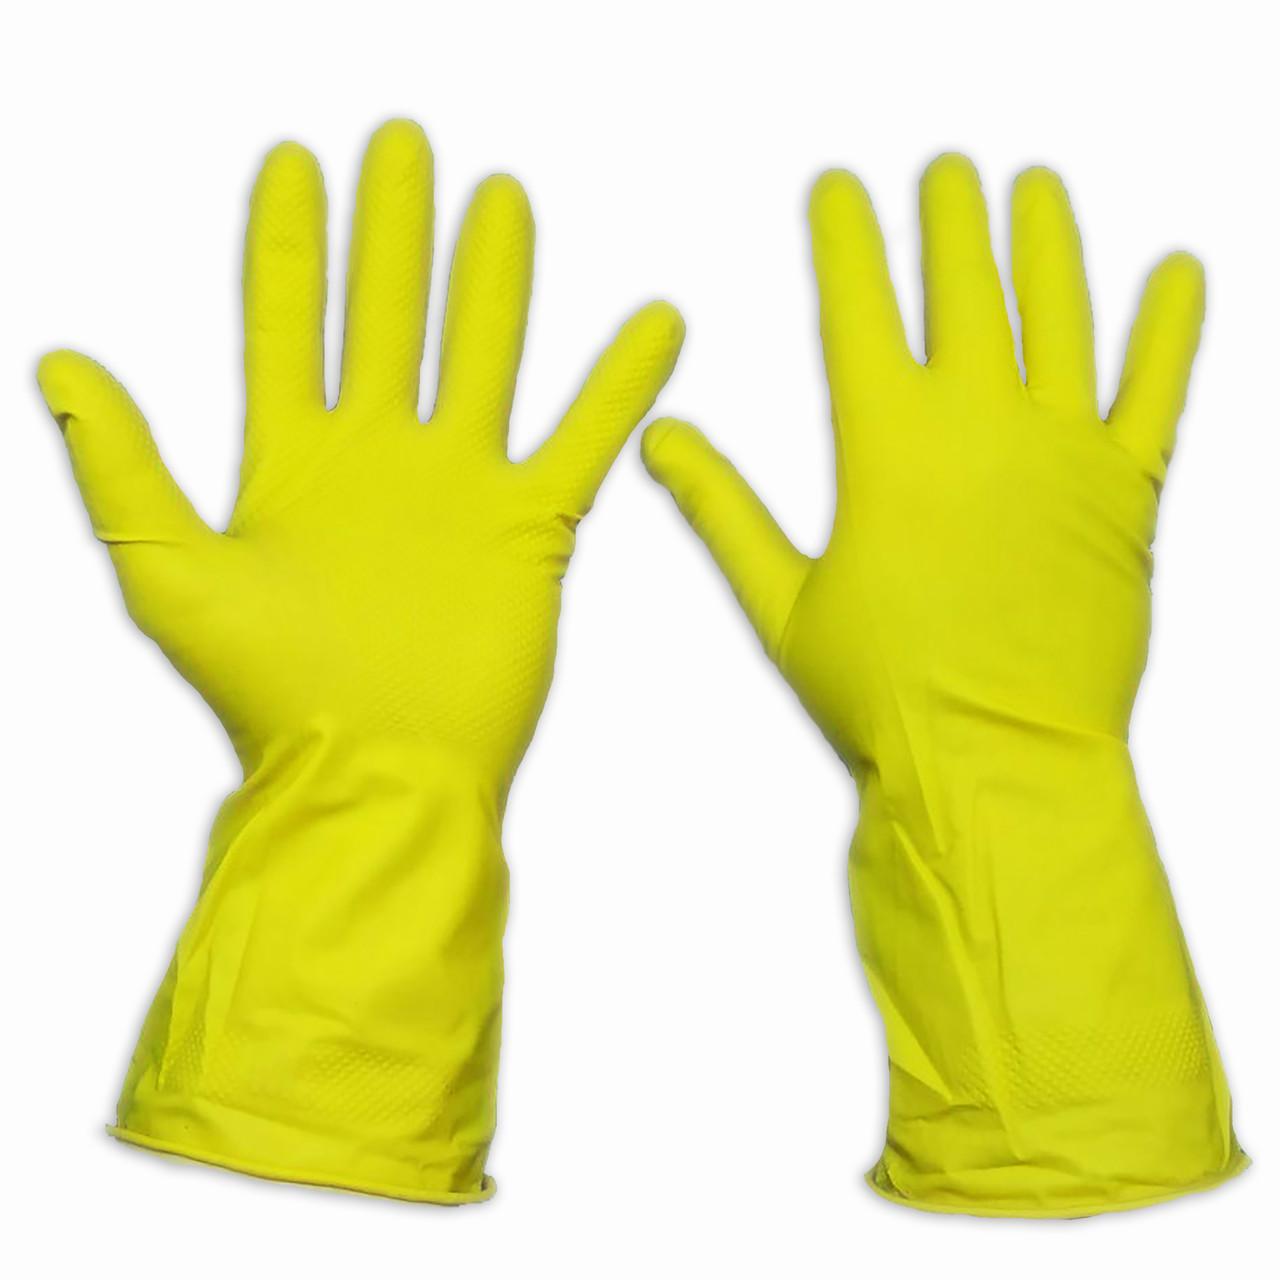 Перчатки для уборки латексные, прочные, Household Gloves, размер — L